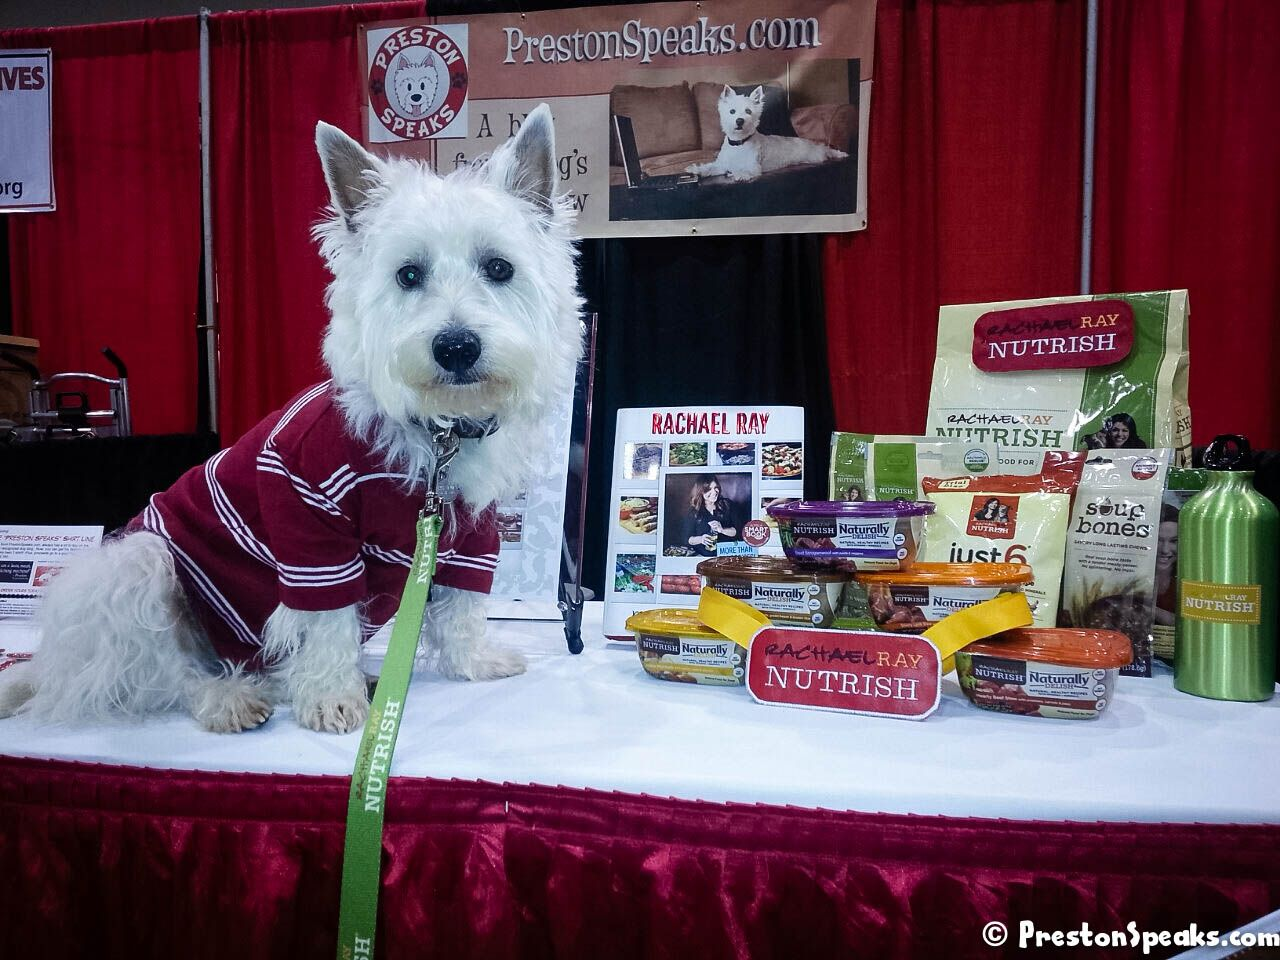 2013 Atlanta Pet Expo Amazing Pet Expos Coverage of from